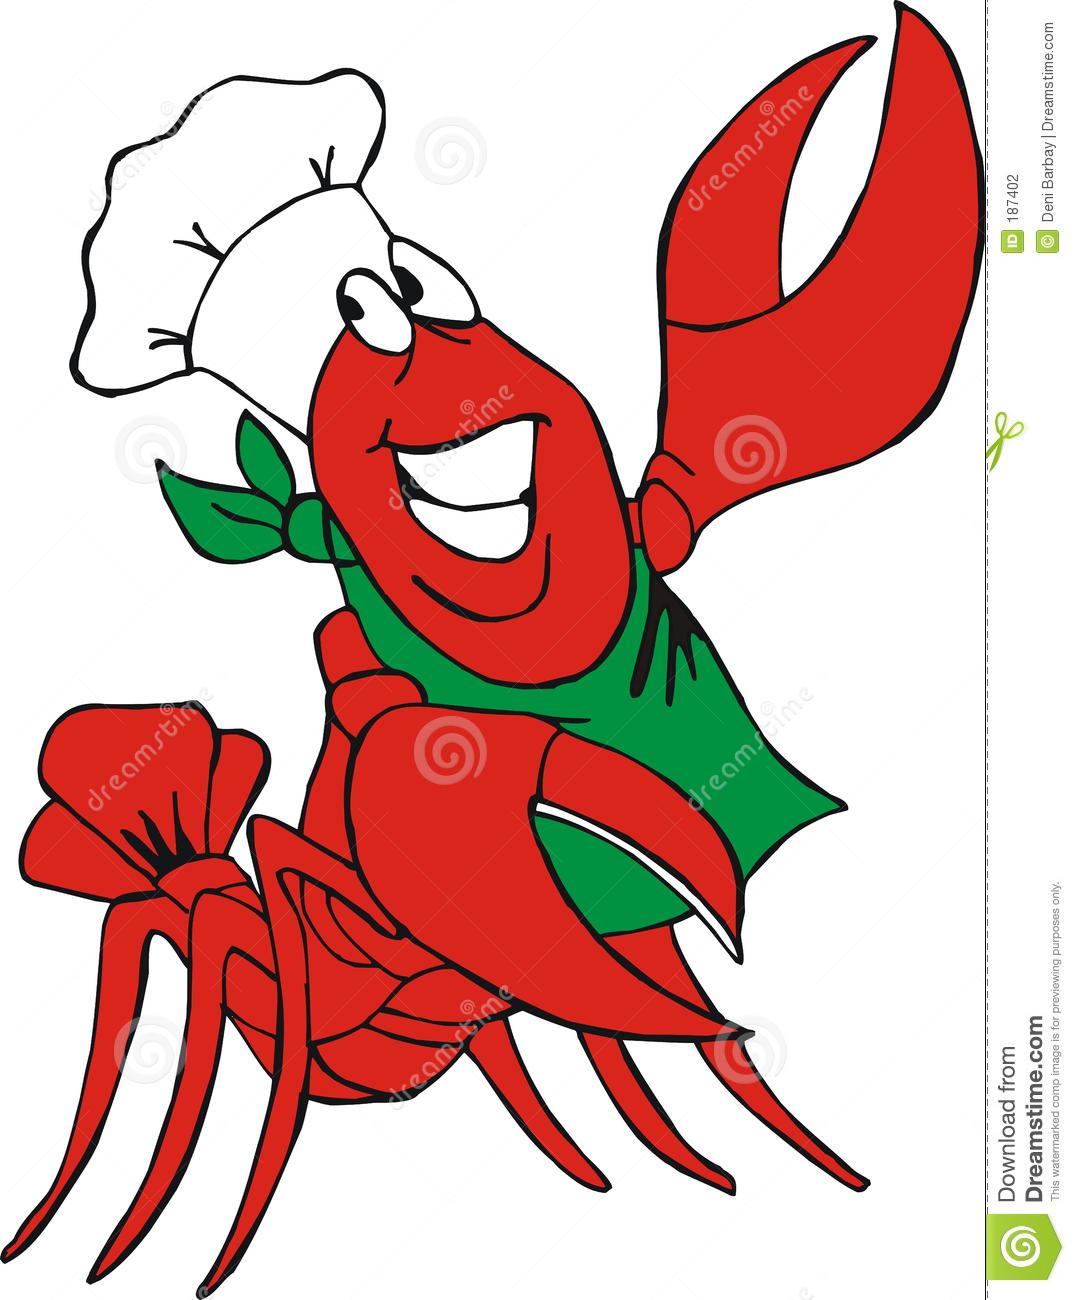 Crawfish Clip Art Free - .